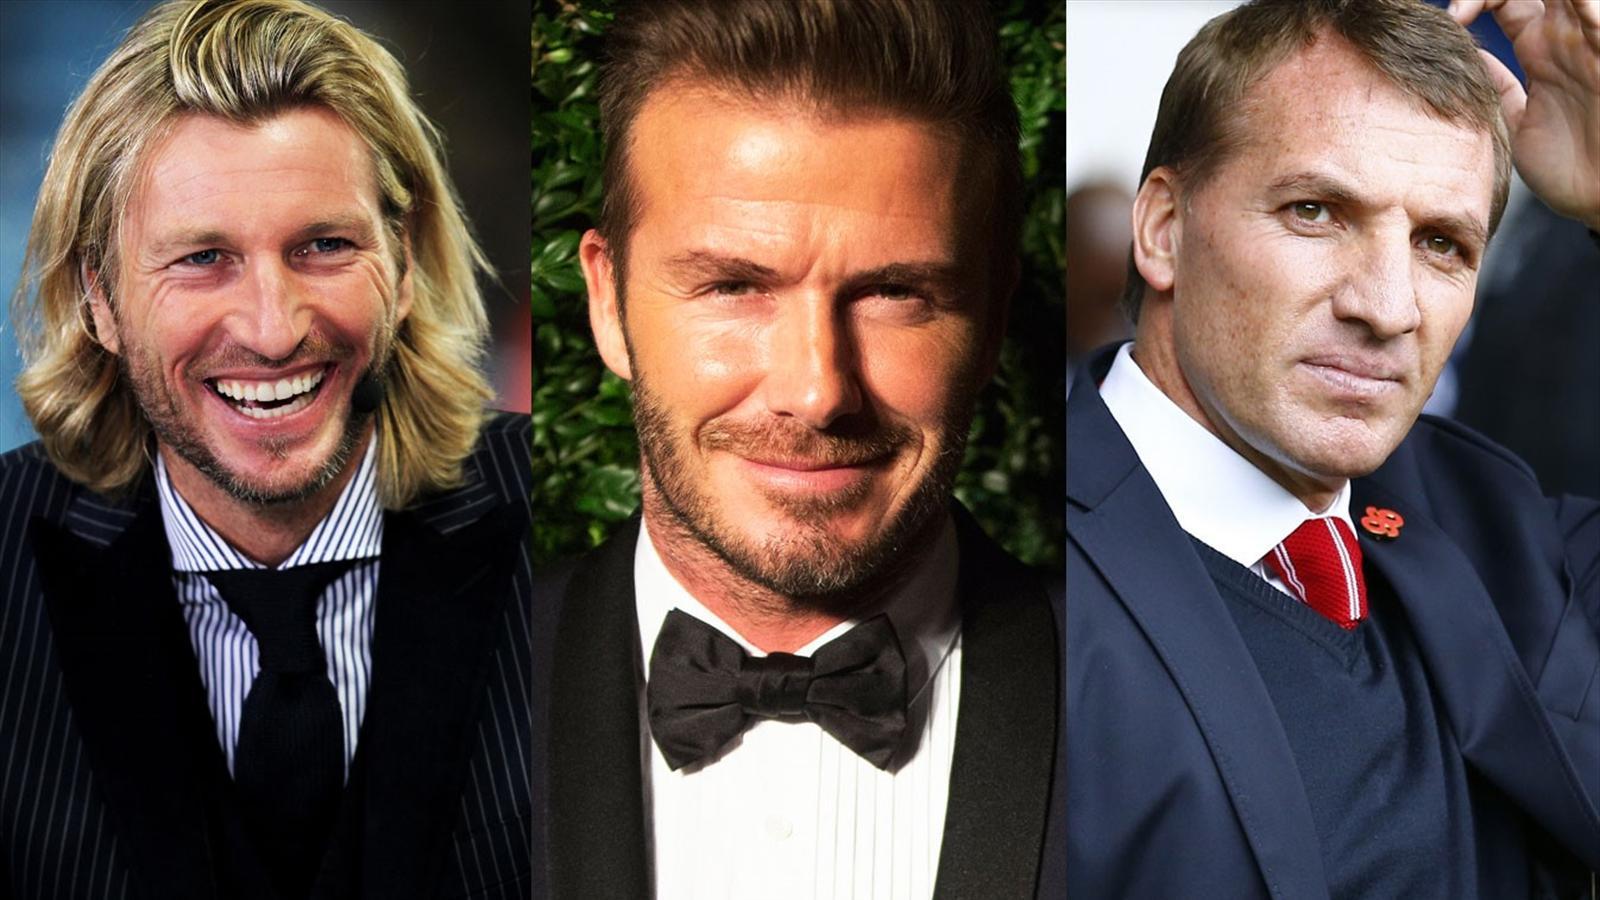 Robbie Savage, David Beckham and Brendan Rodgers